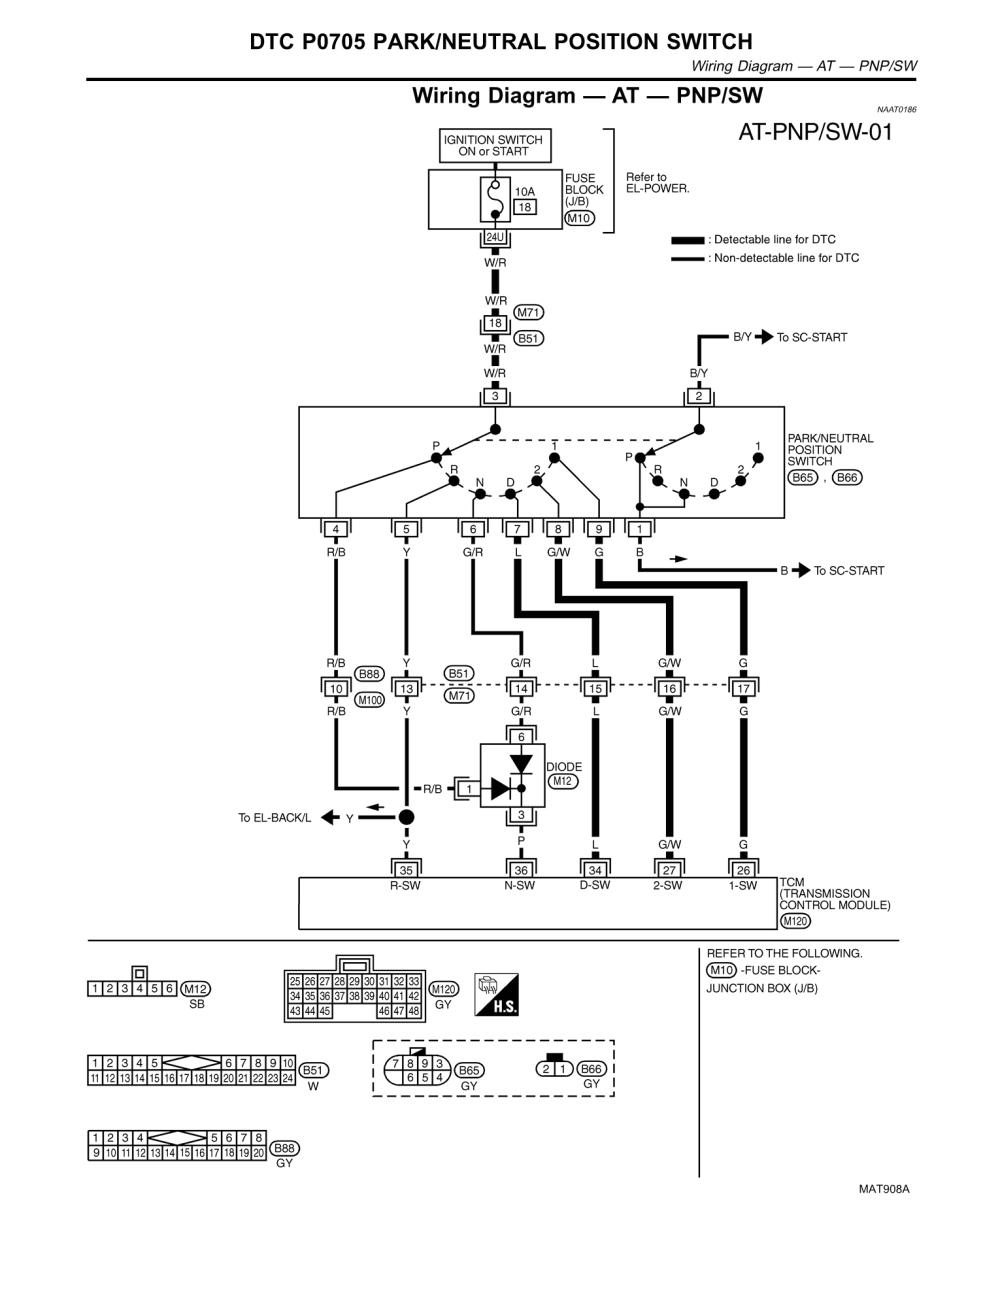 2007 toyota Tacoma Wiring Diagram C7fda 2010 Tundra Fuse Box Location Wiring Library